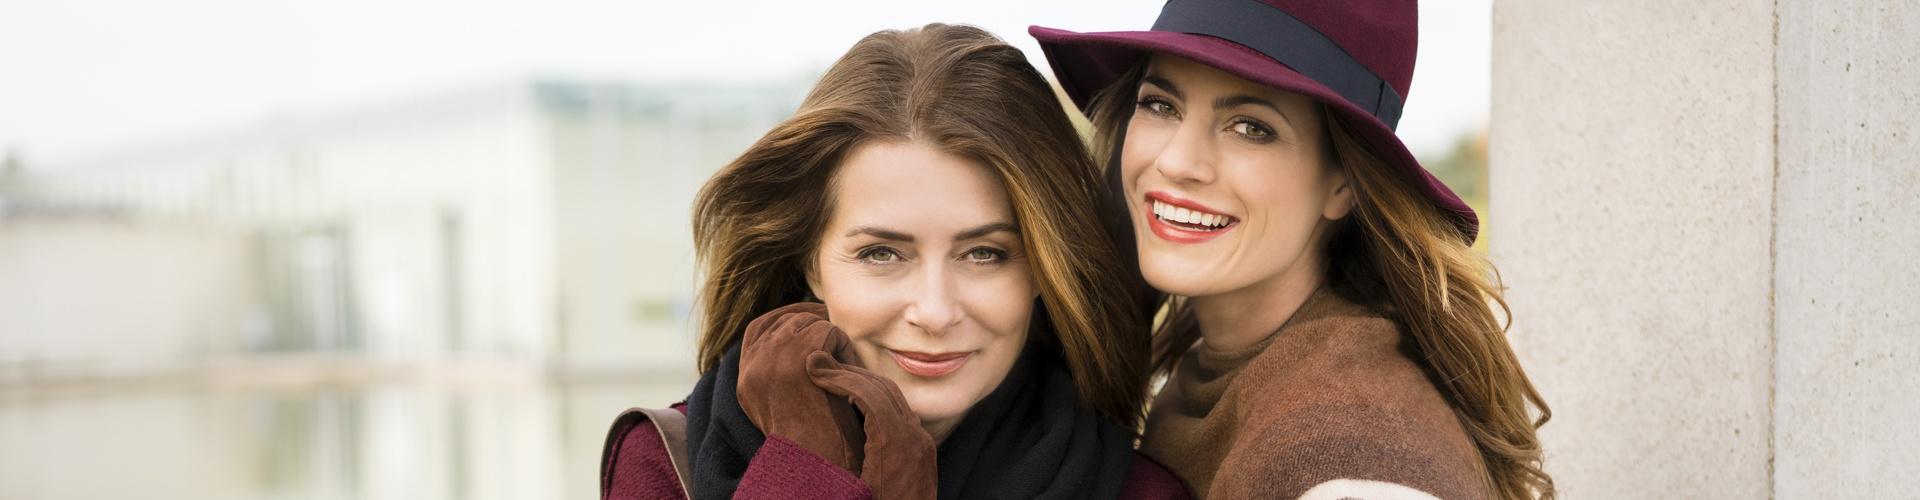 Frauen in Herbstmode Ofa Bamberg